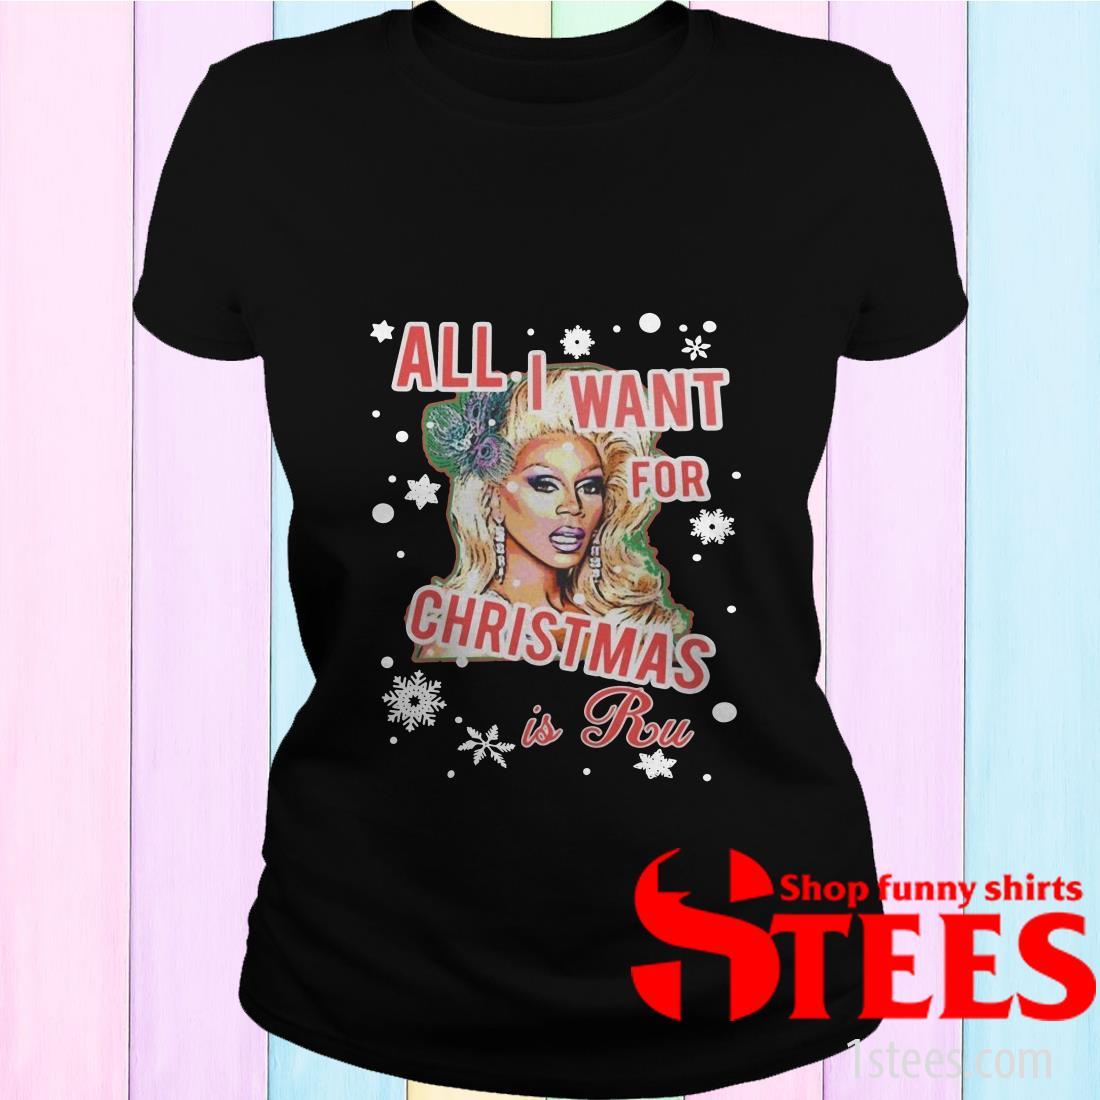 All I Want For Christmas Is Ru Sweatshirt